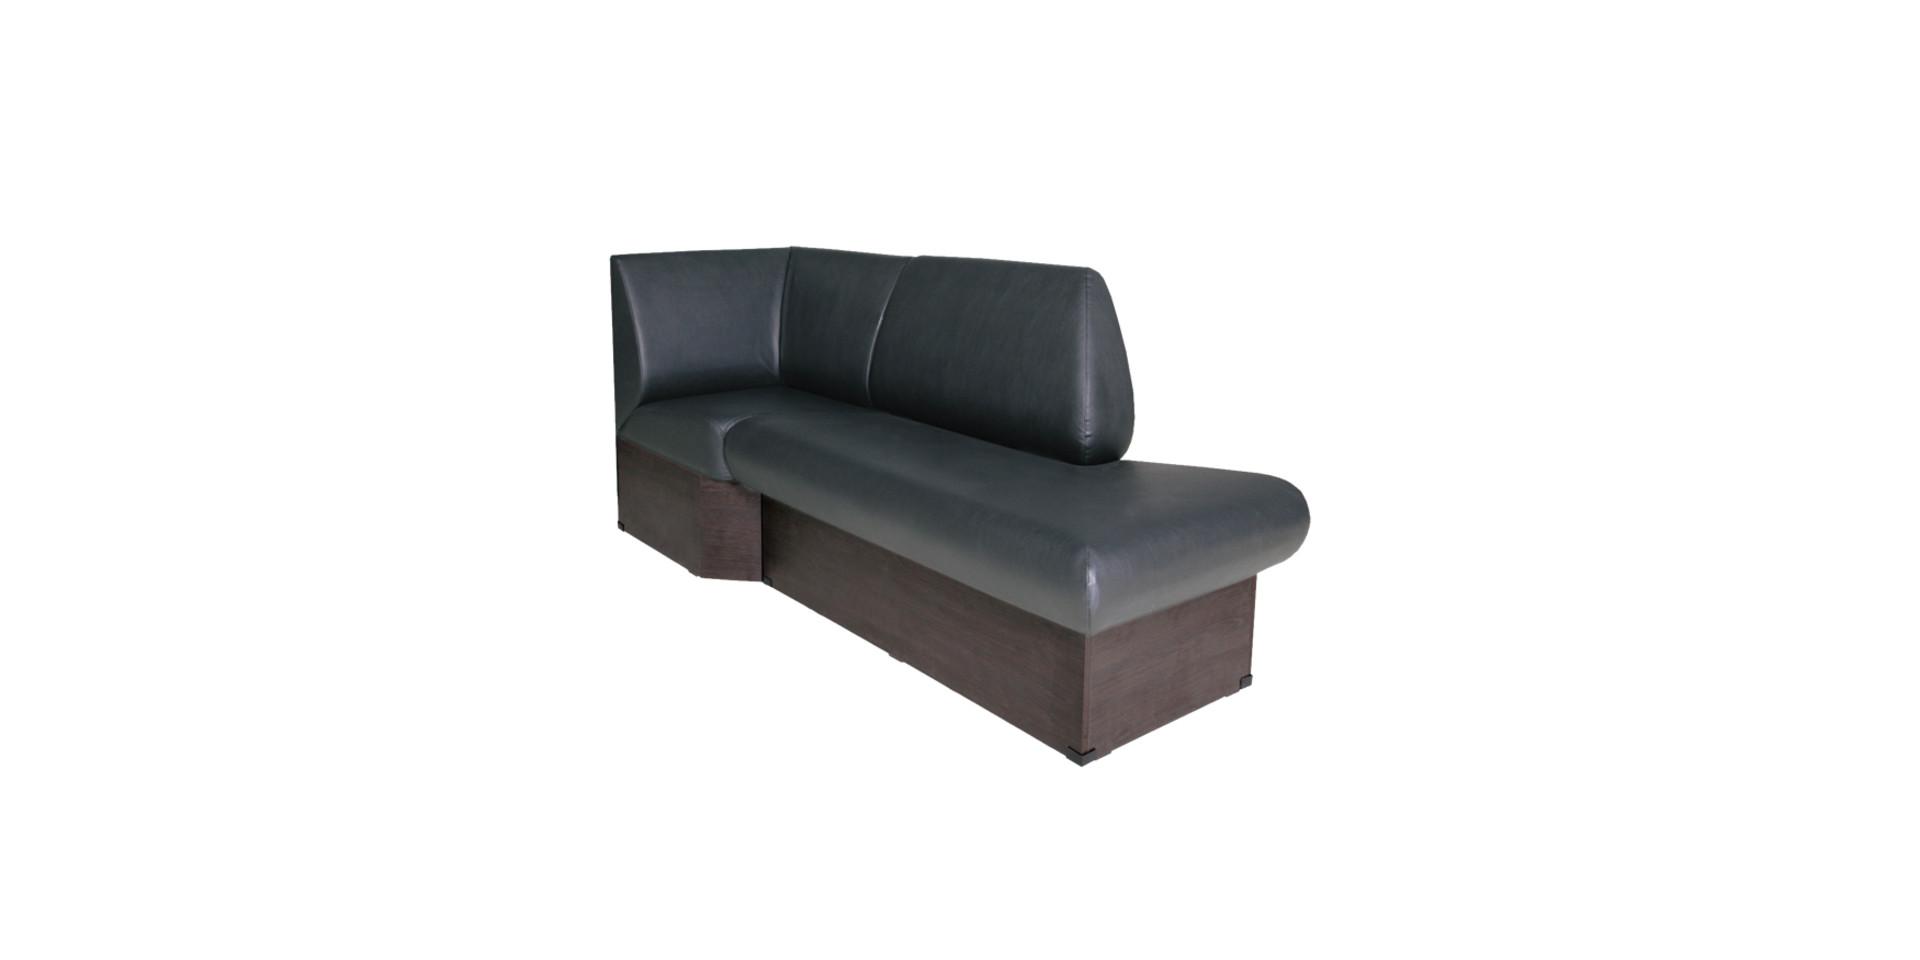 sits-brita-angle-corner90_bench_oasi_black_3